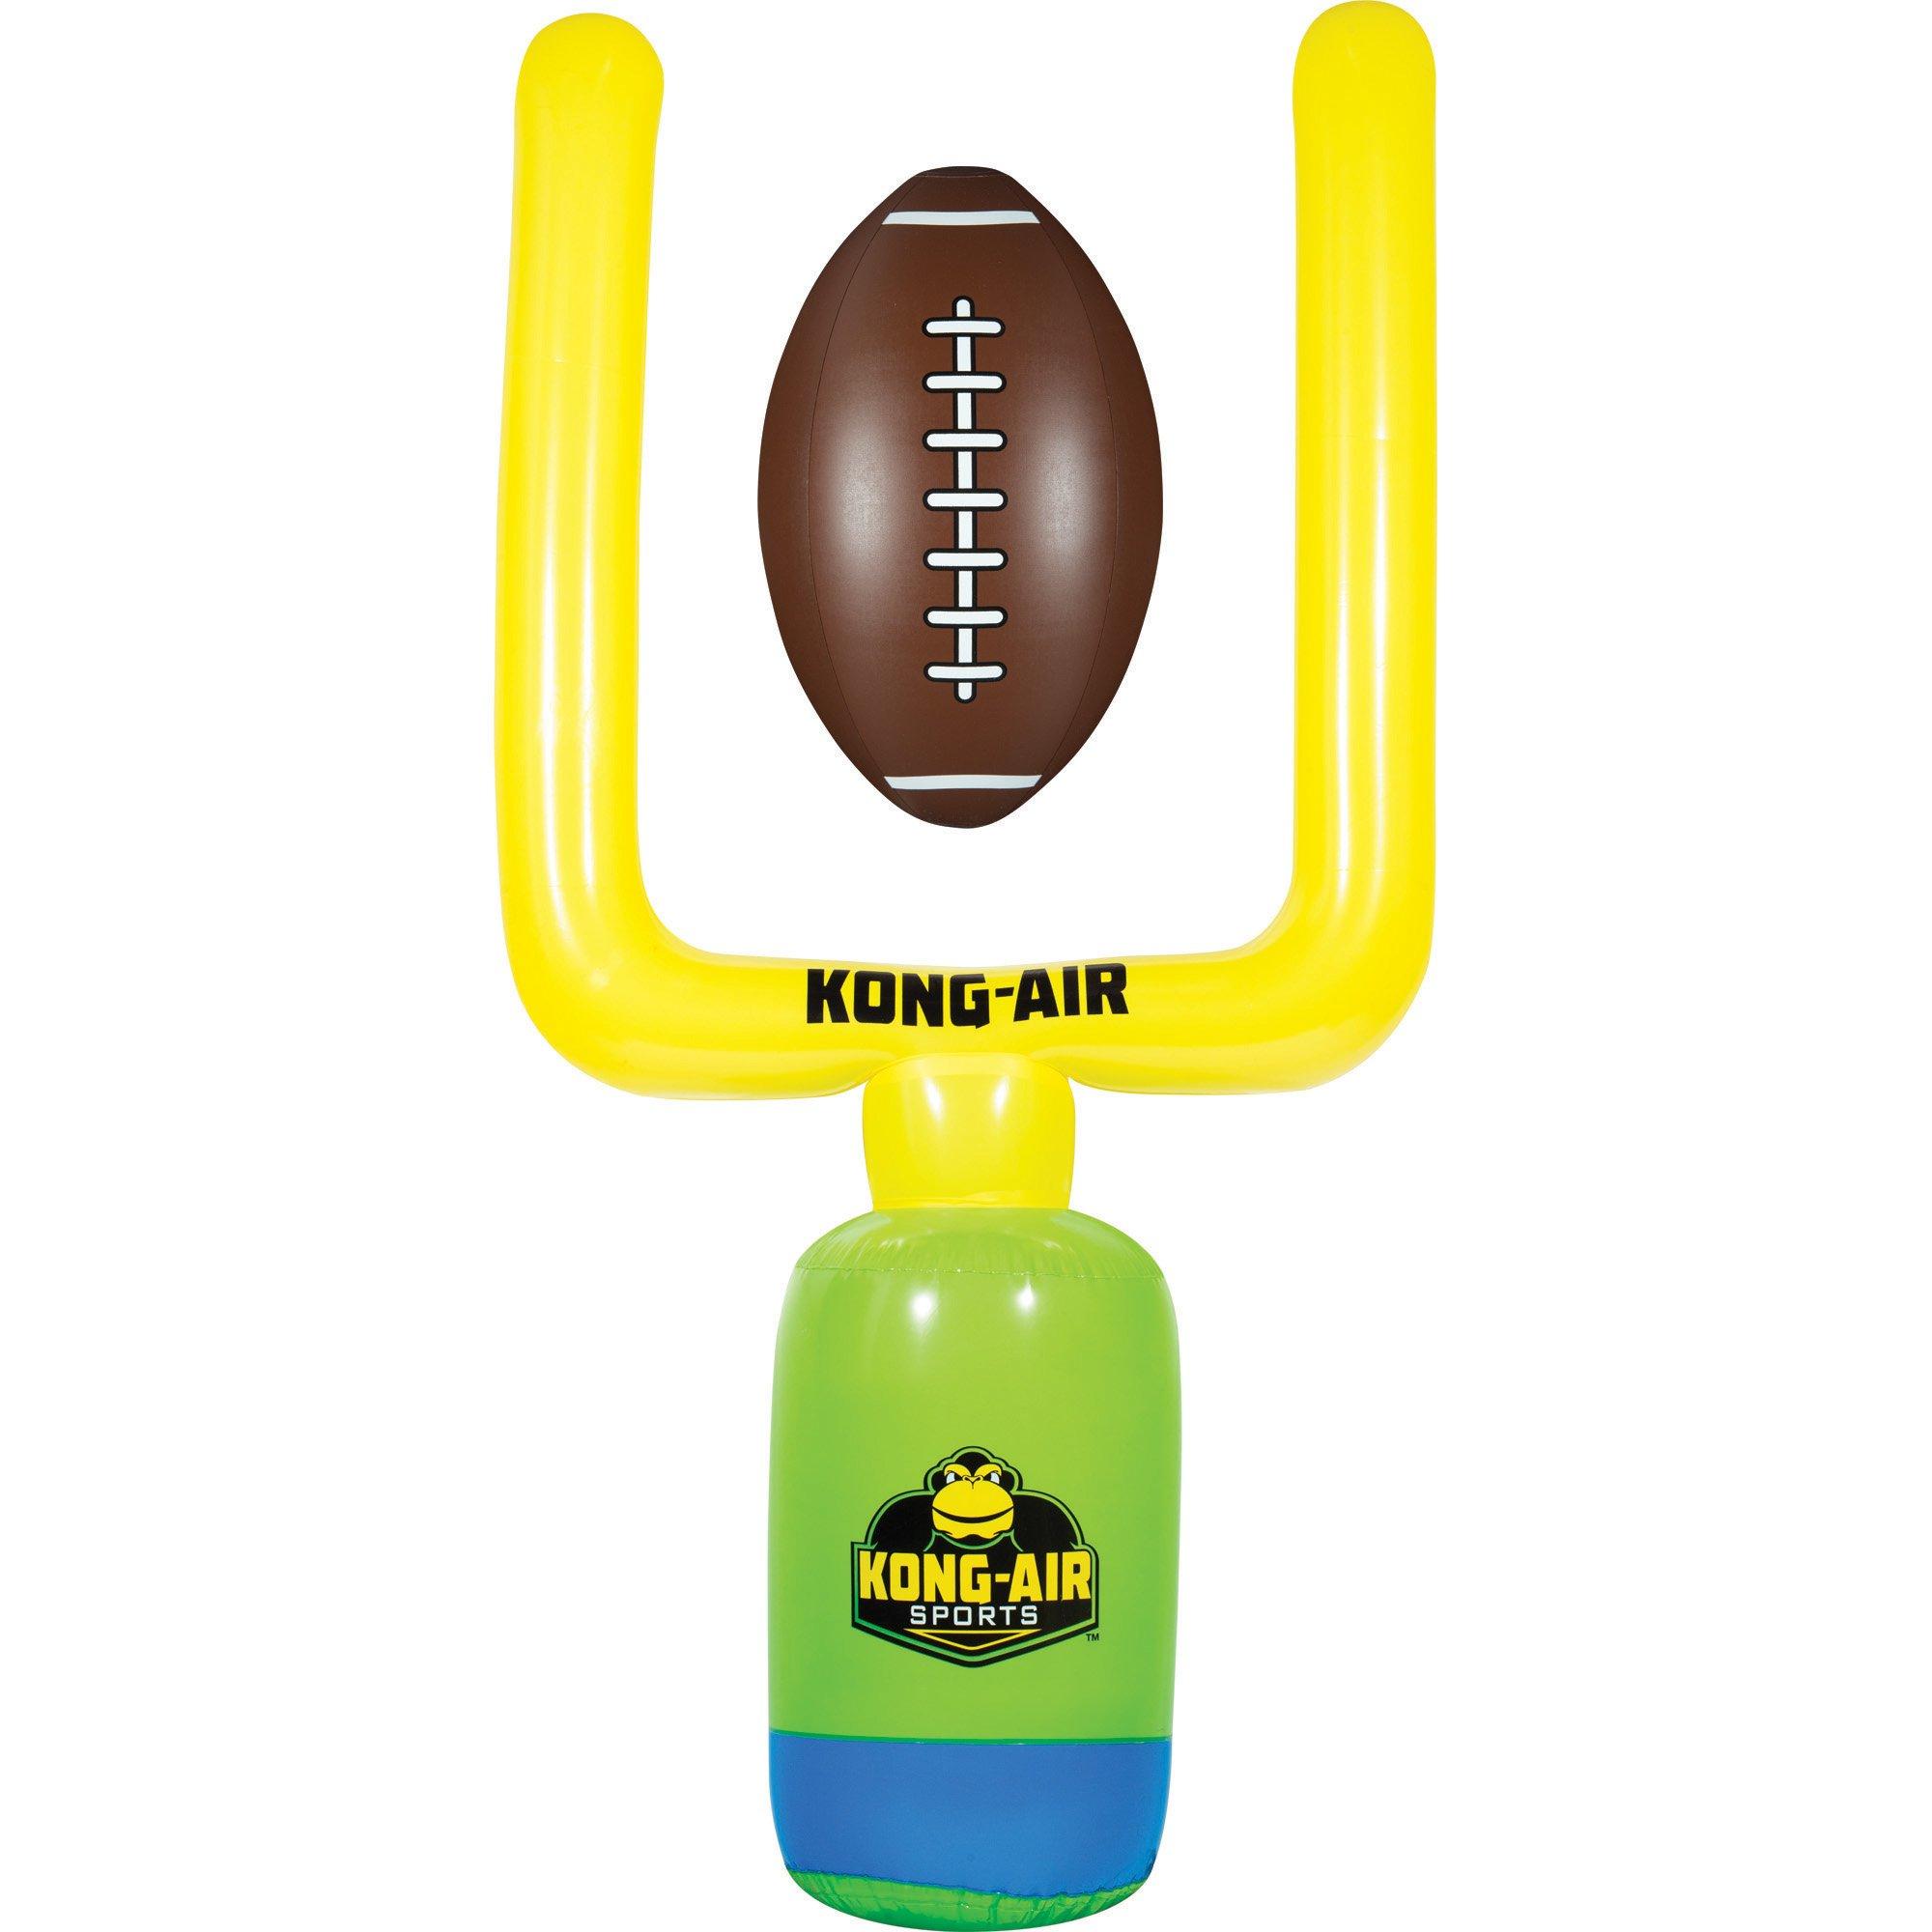 Franklin Sports Kong-Air Sports Football Set - 7 Feet Tall!